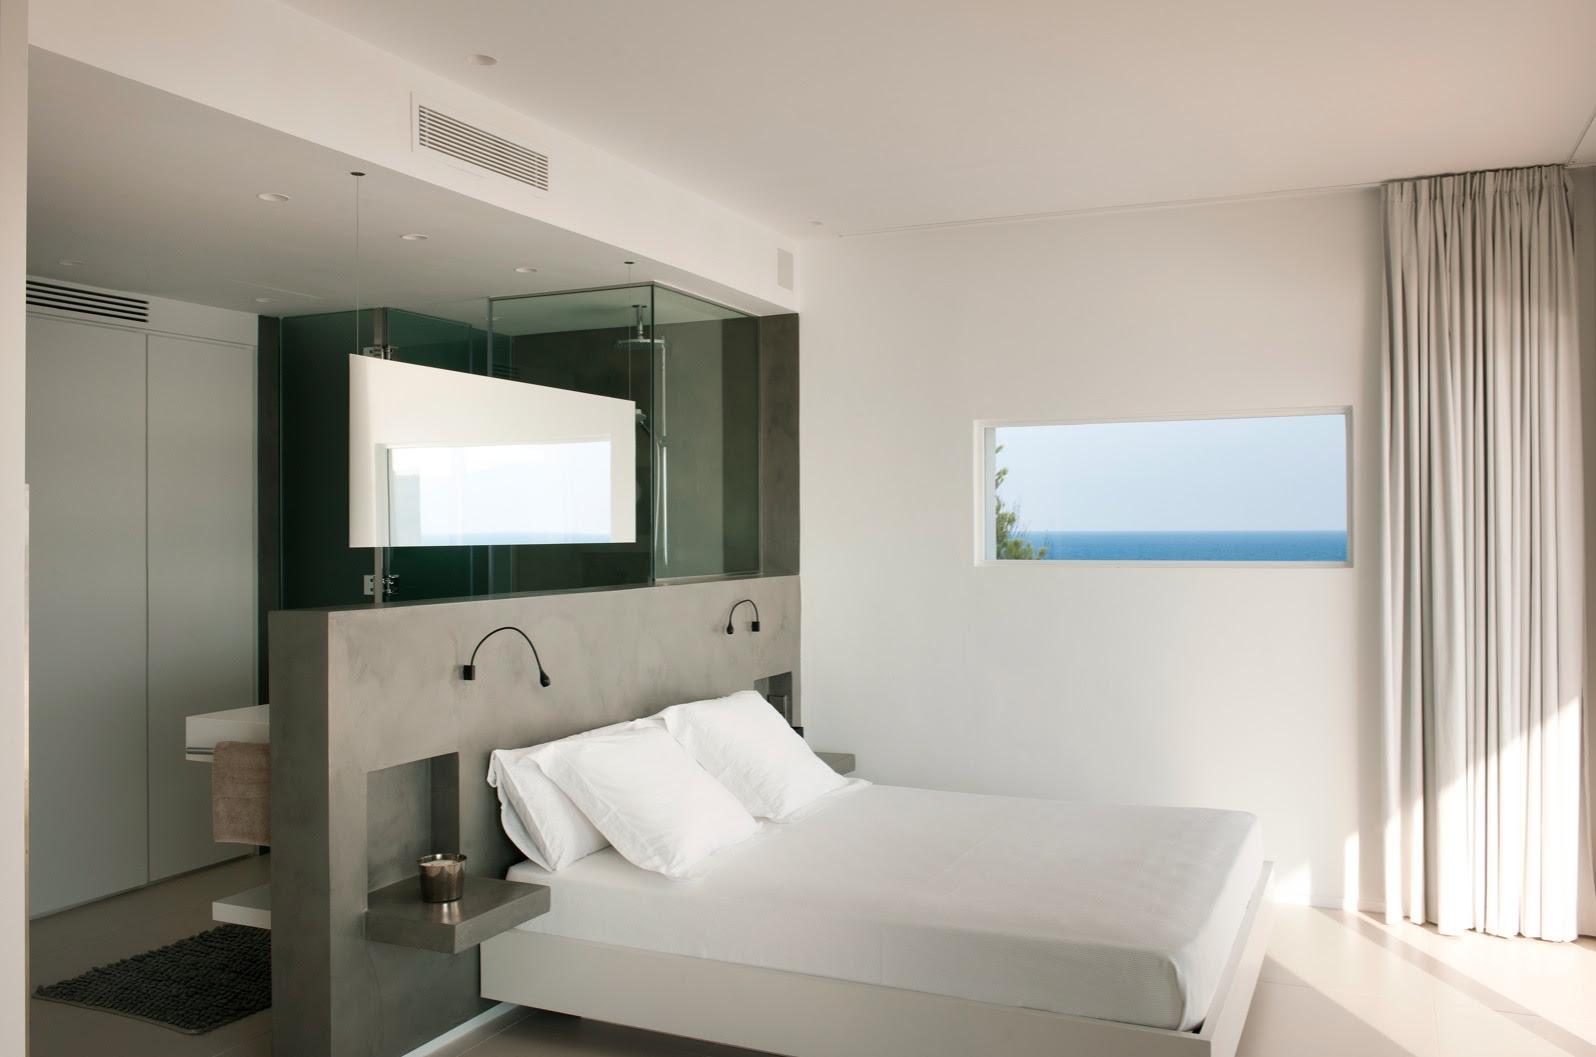 The simple interior